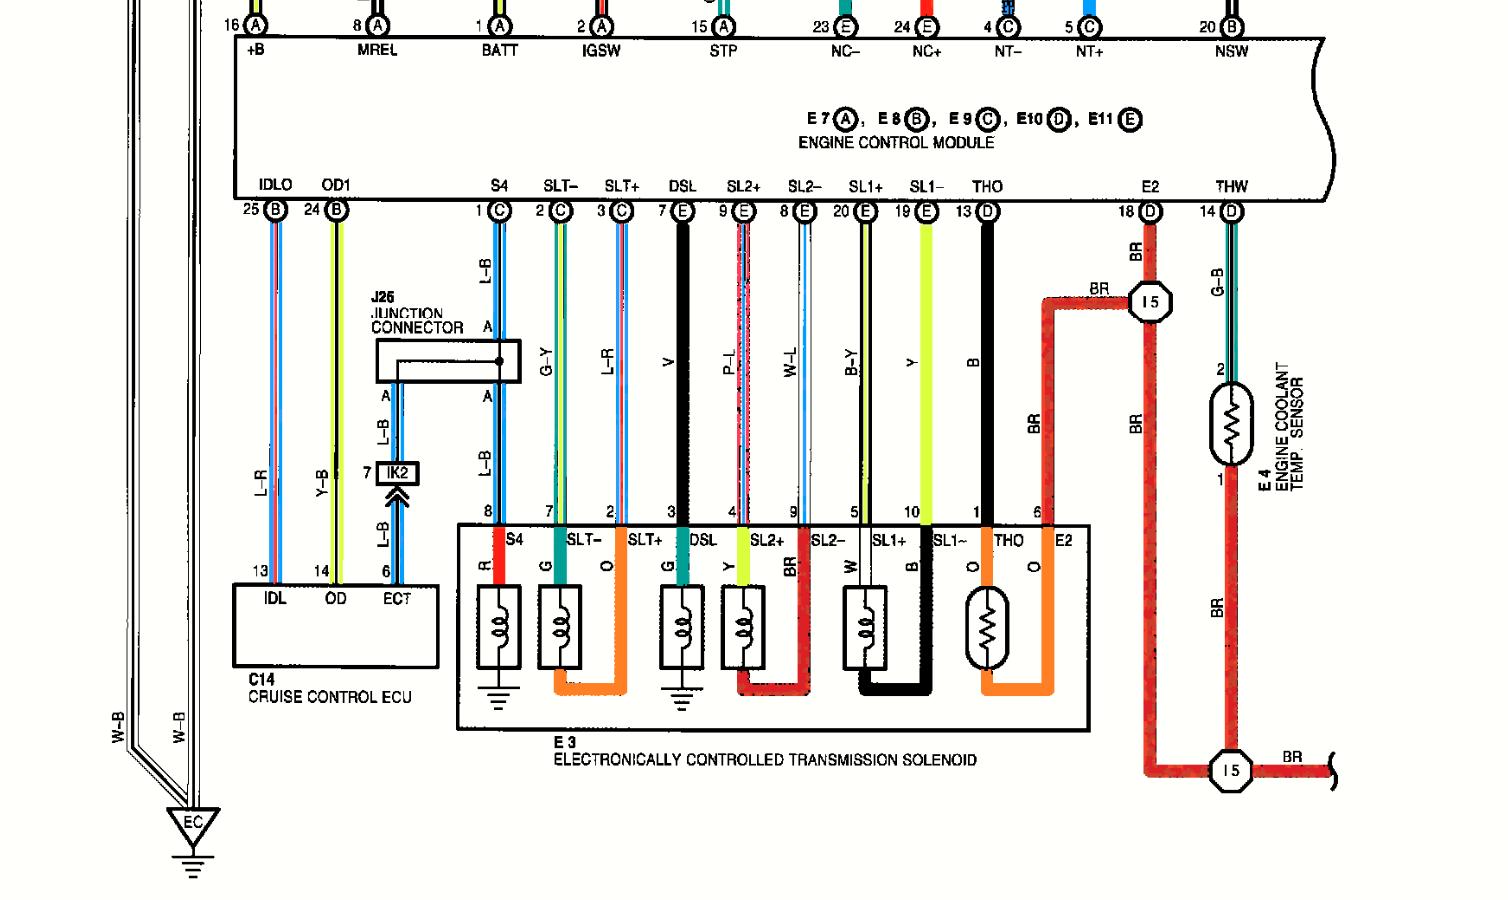 2000 Es300 Transmission Problem   Solenoid  - Clublexus